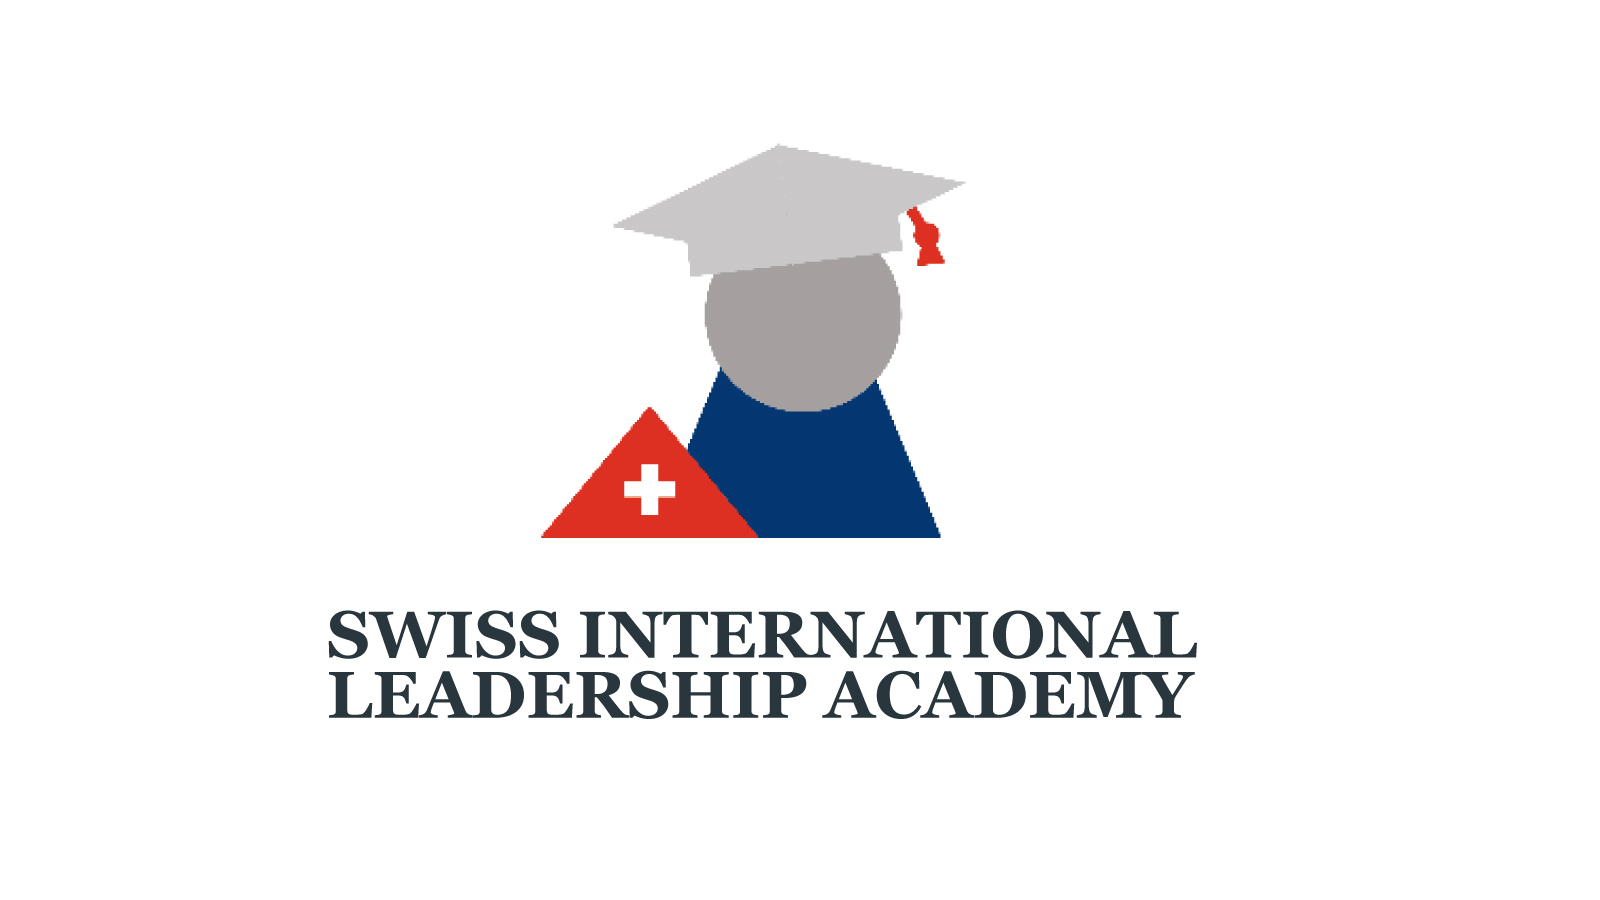 Swiss International Leadership Academy